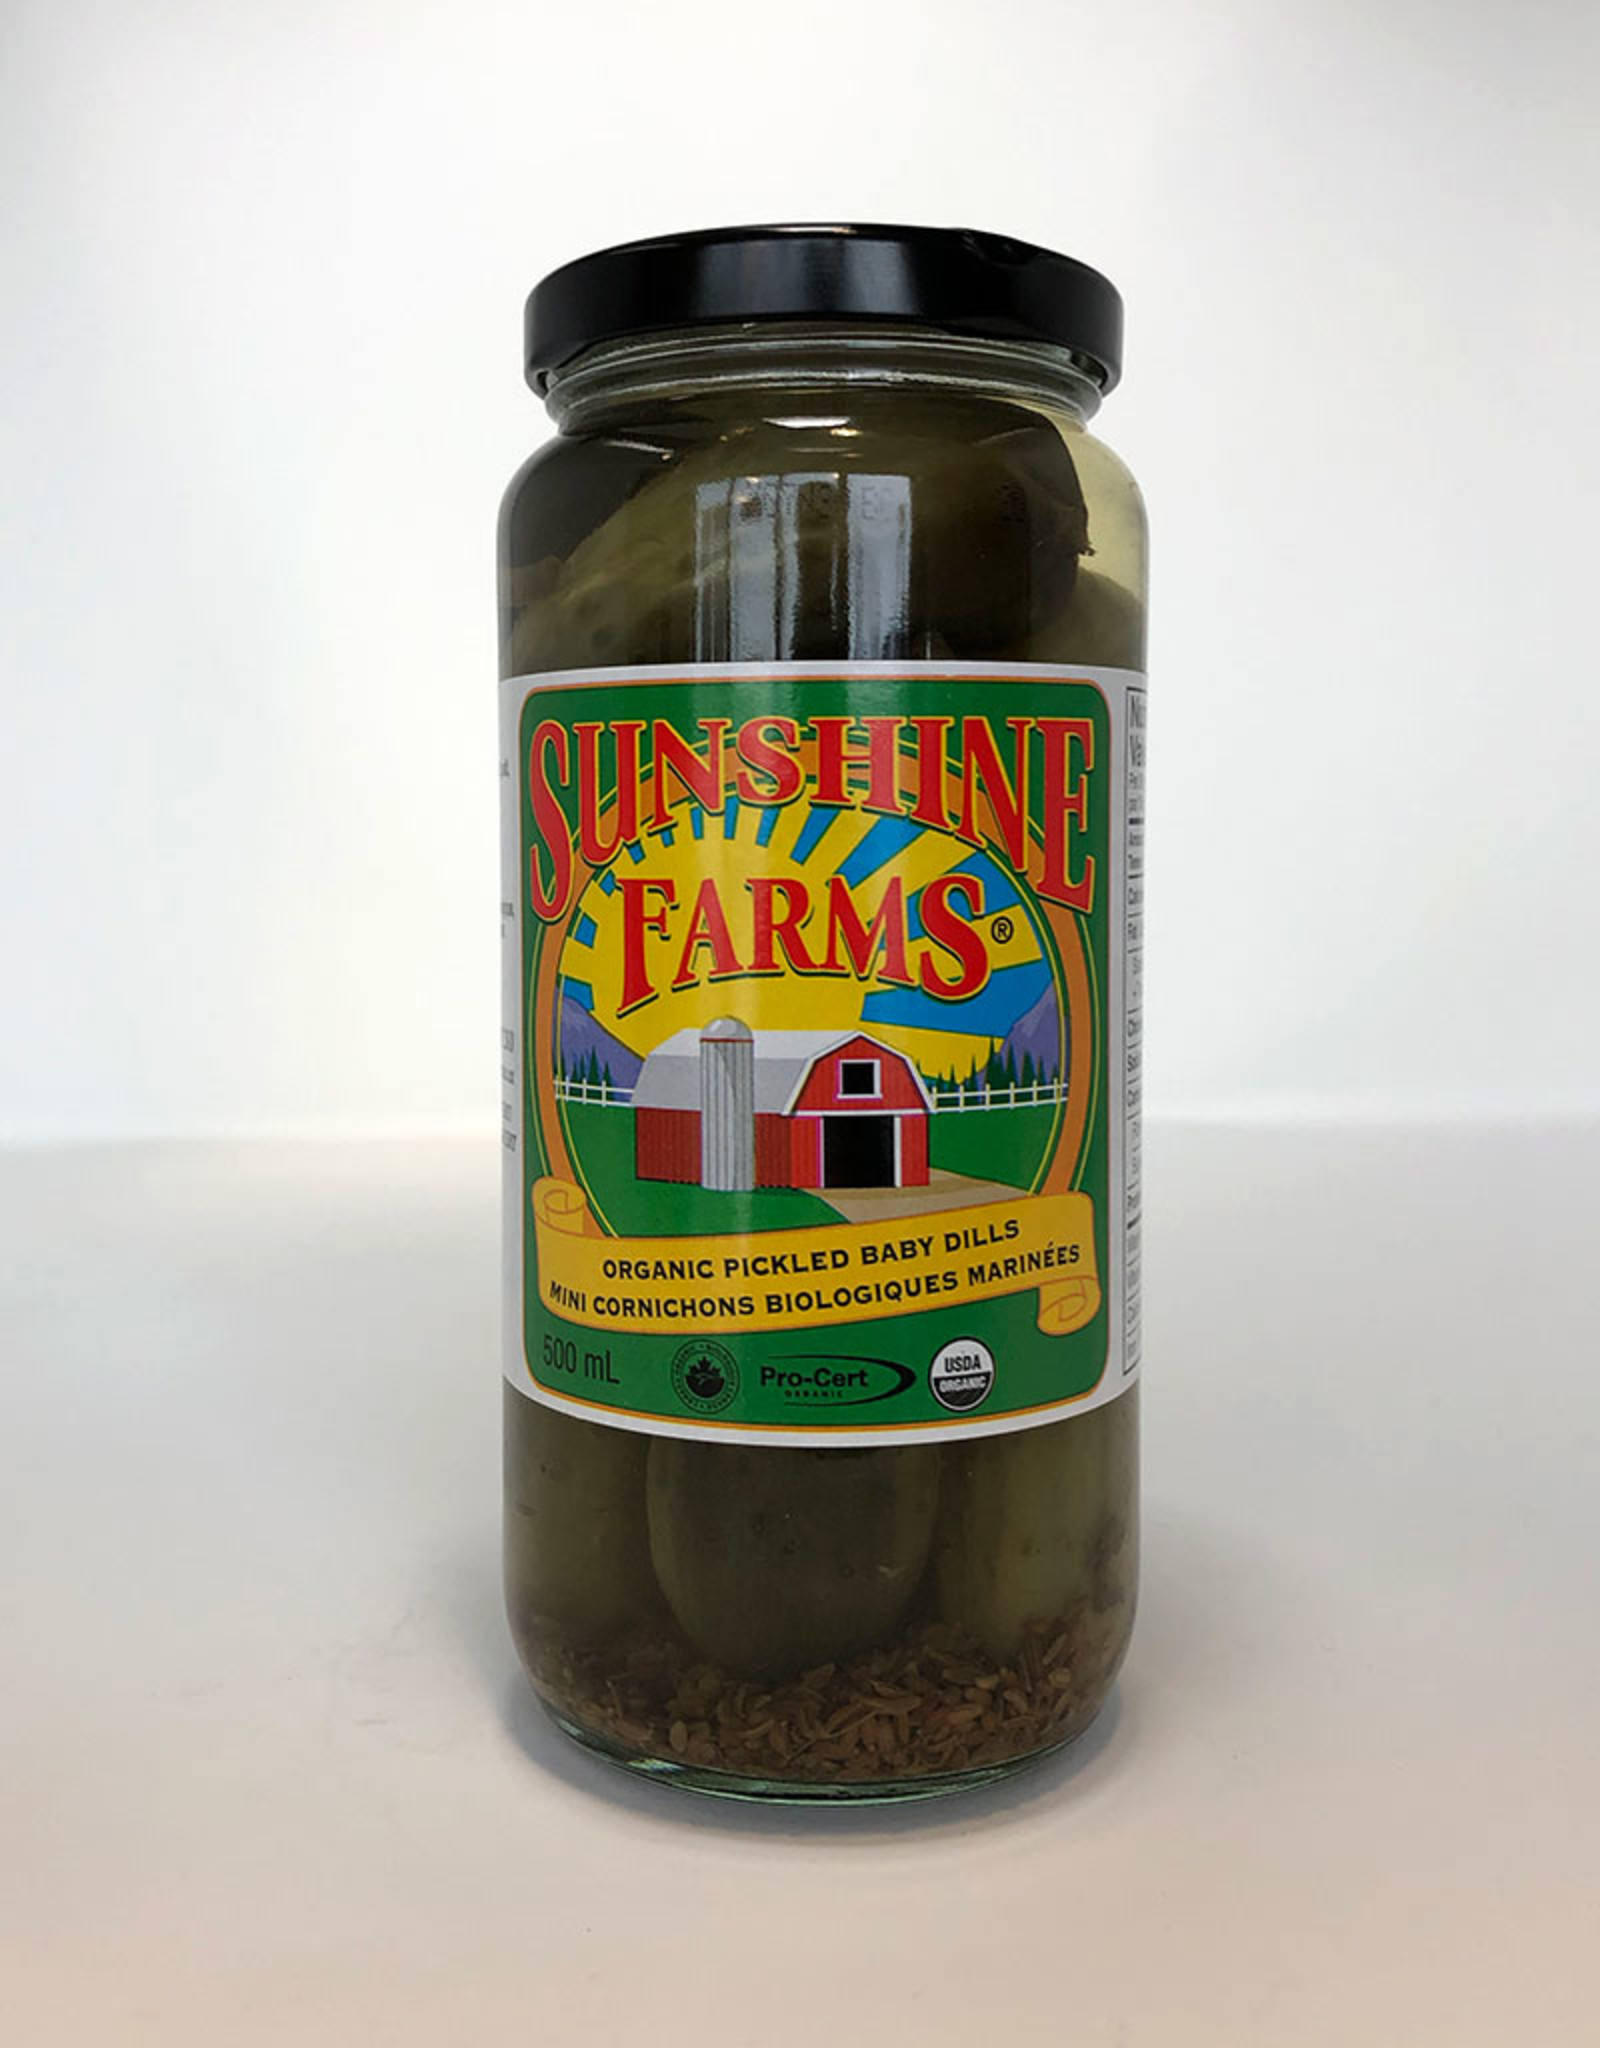 Sunshine Farms Sunshine Farms - Organic Pickled Baby Dills